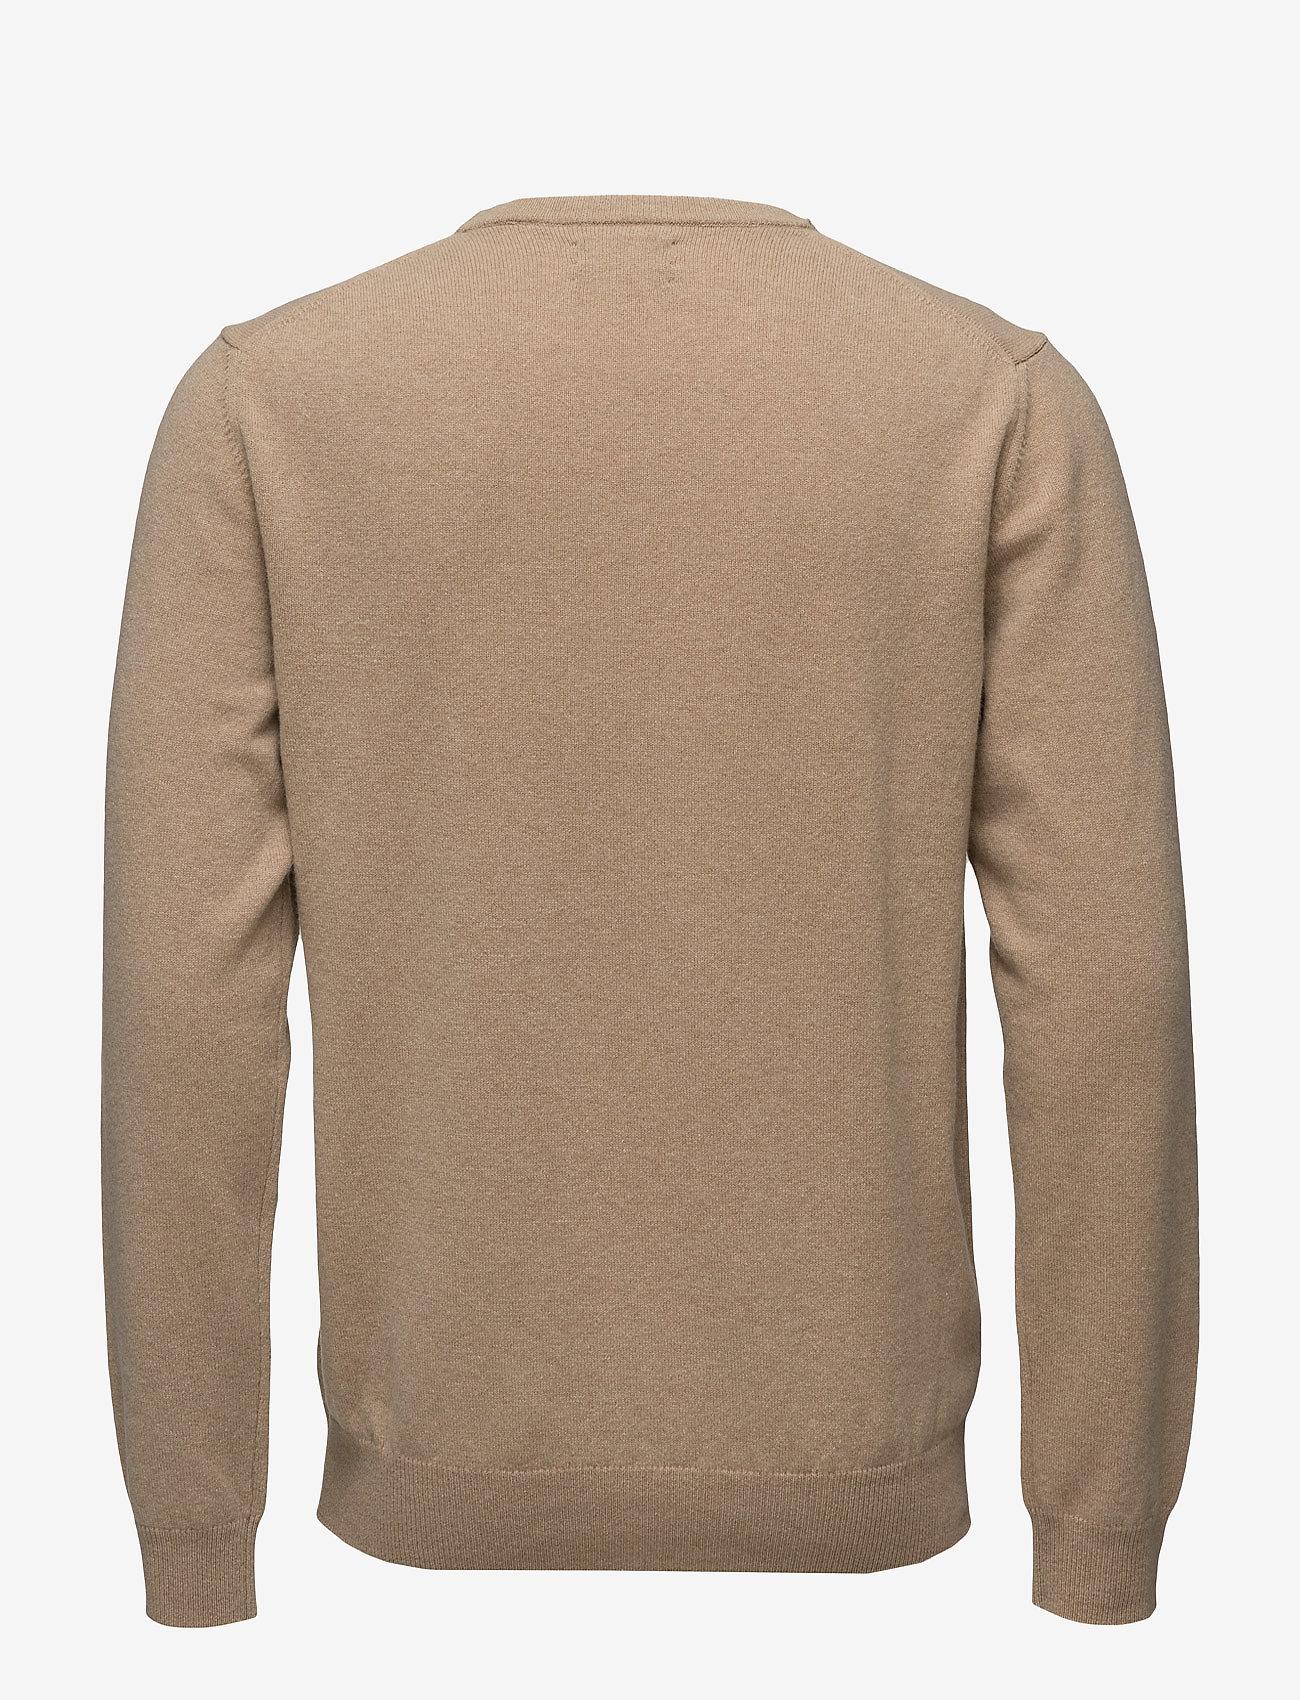 GANT - SUPERFINE LAMBSWOOL CREW - basic knitwear - dk. sand melange - 1